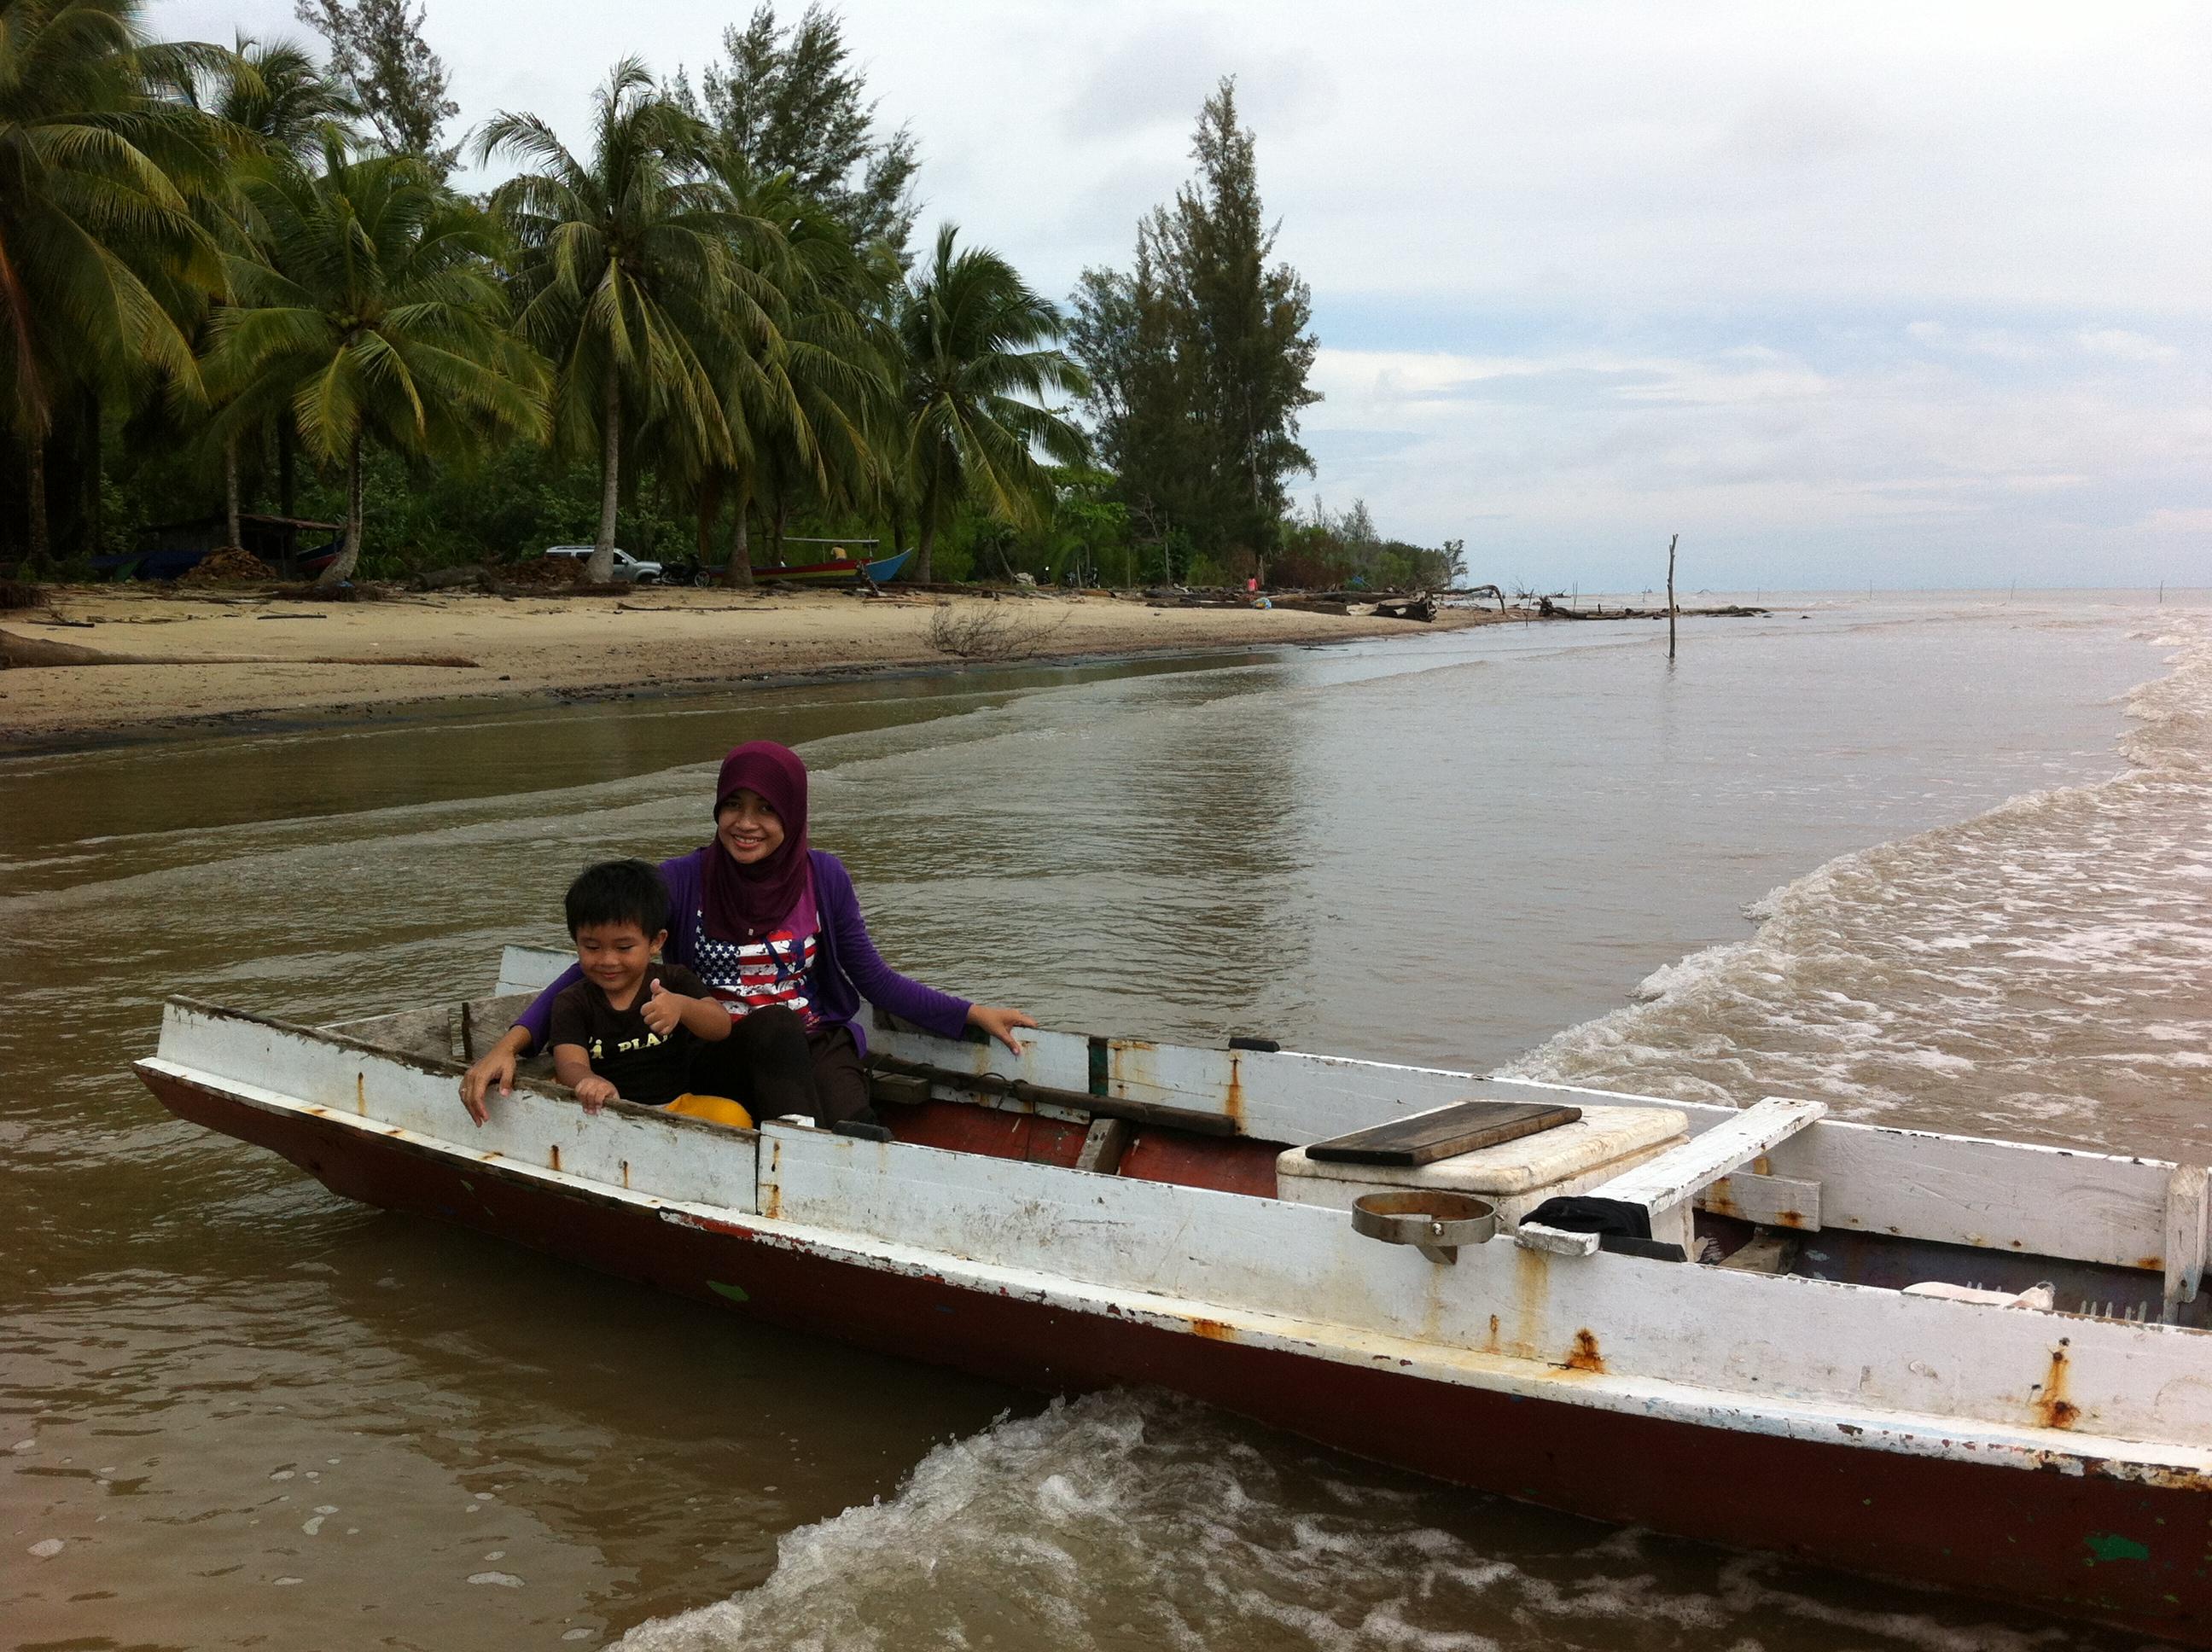 Bunyu Pulau Kecil Hangat Andriwidi Pantai Seikura Tpi Kab Bulungan